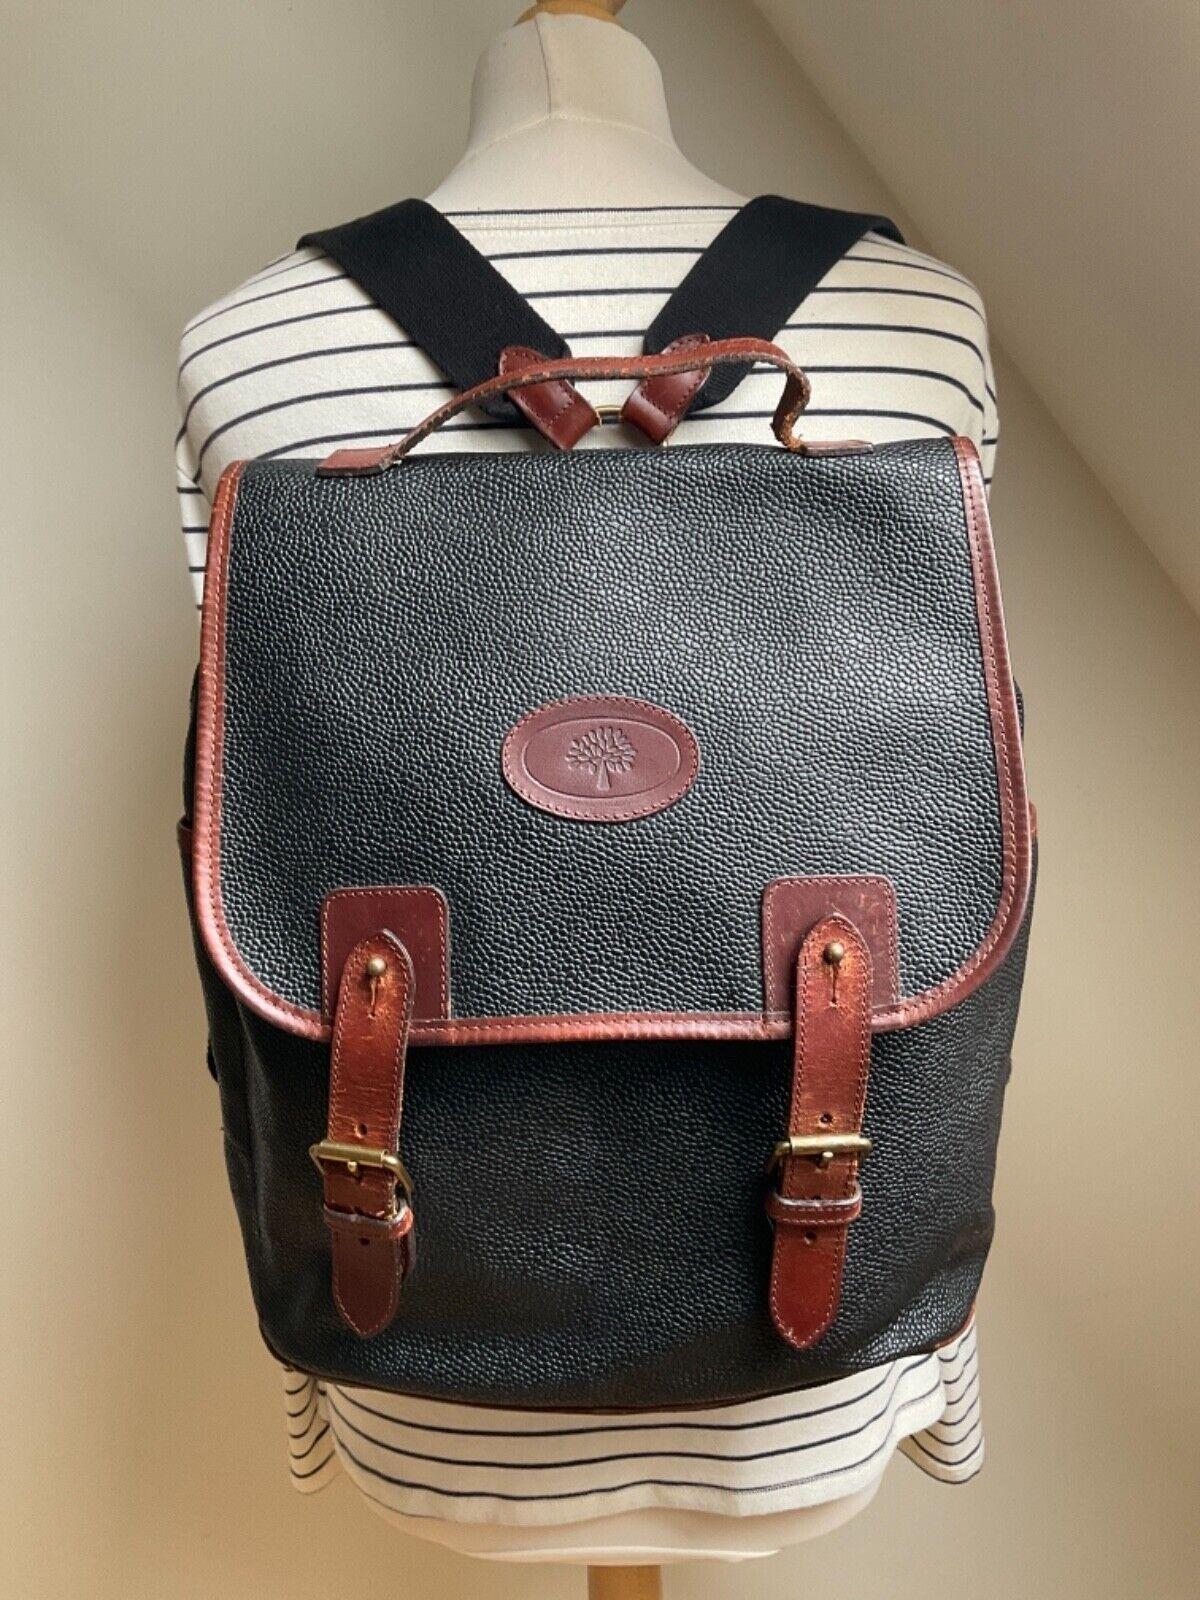 Vintage Mulberry black Scotchgrain + branston leather trim backpack rucksack bag